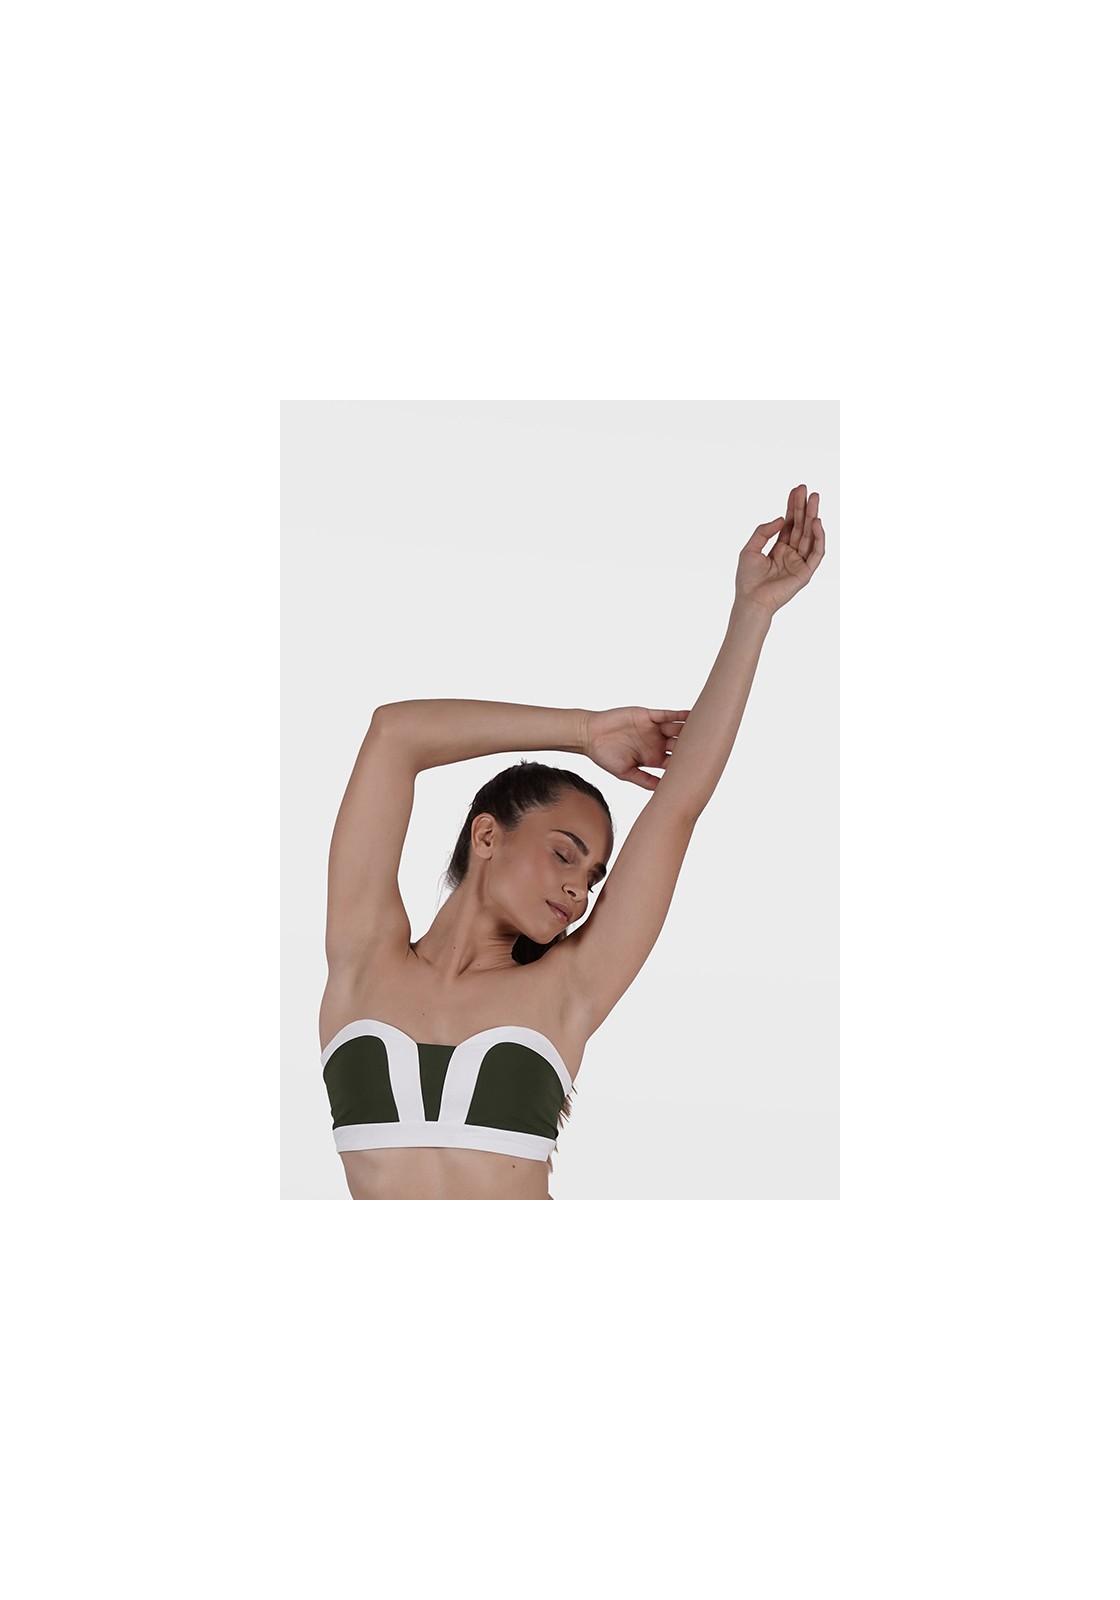 AURELIE TOP Khakiand white bikini top in bandeau style -  Maillot de bain prix doux